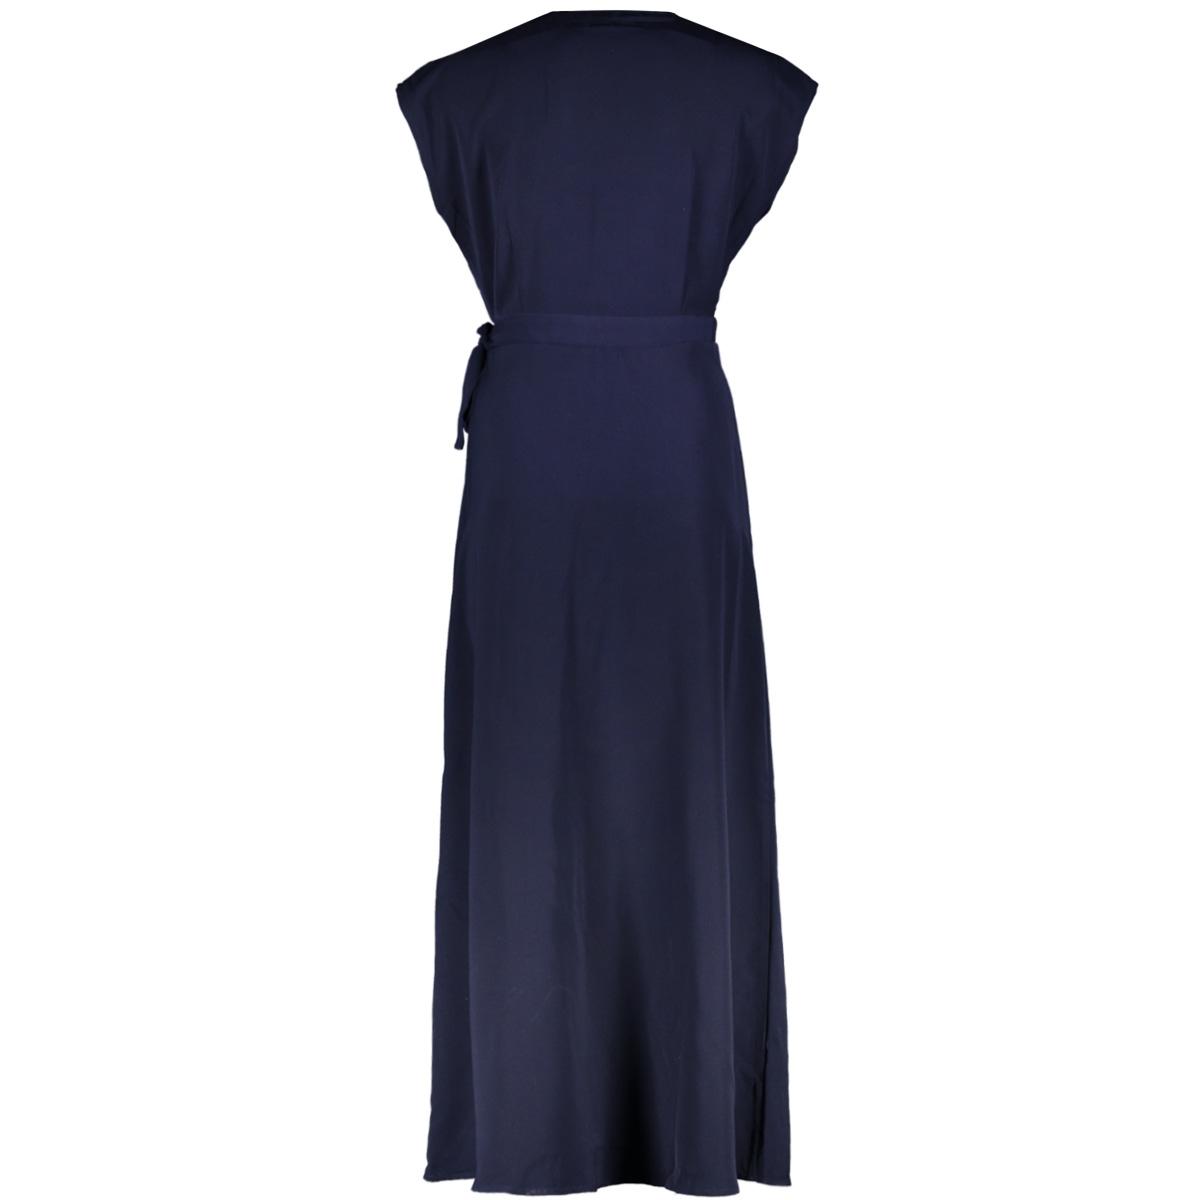 onlmina s/s ancle dress wvn 15202591 only jurk night sky